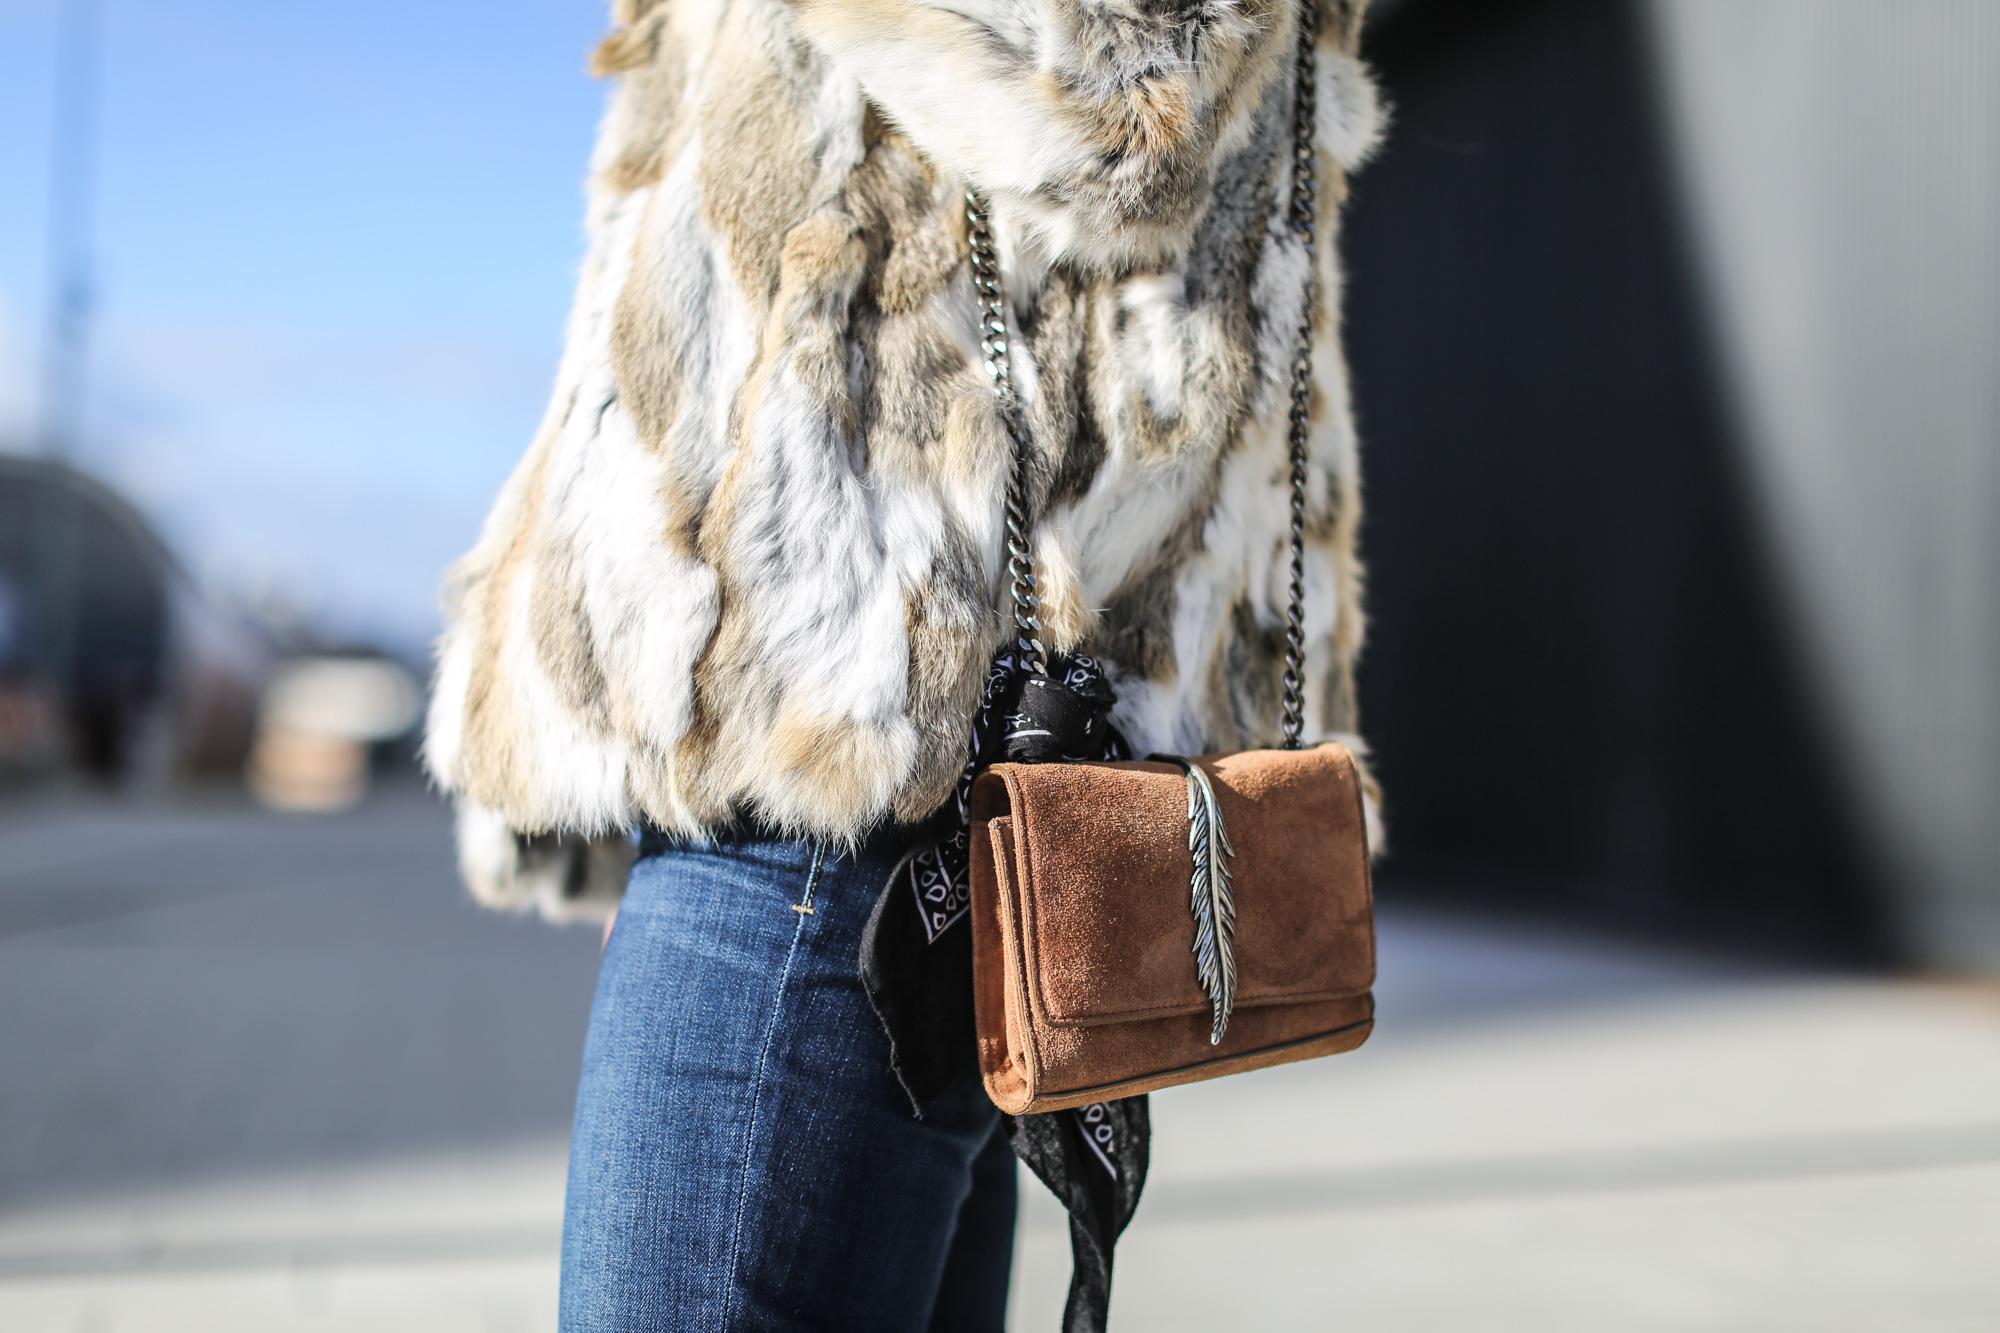 Clochet_streetstyle_blanco_fur_jacket_cowboy_boots-8